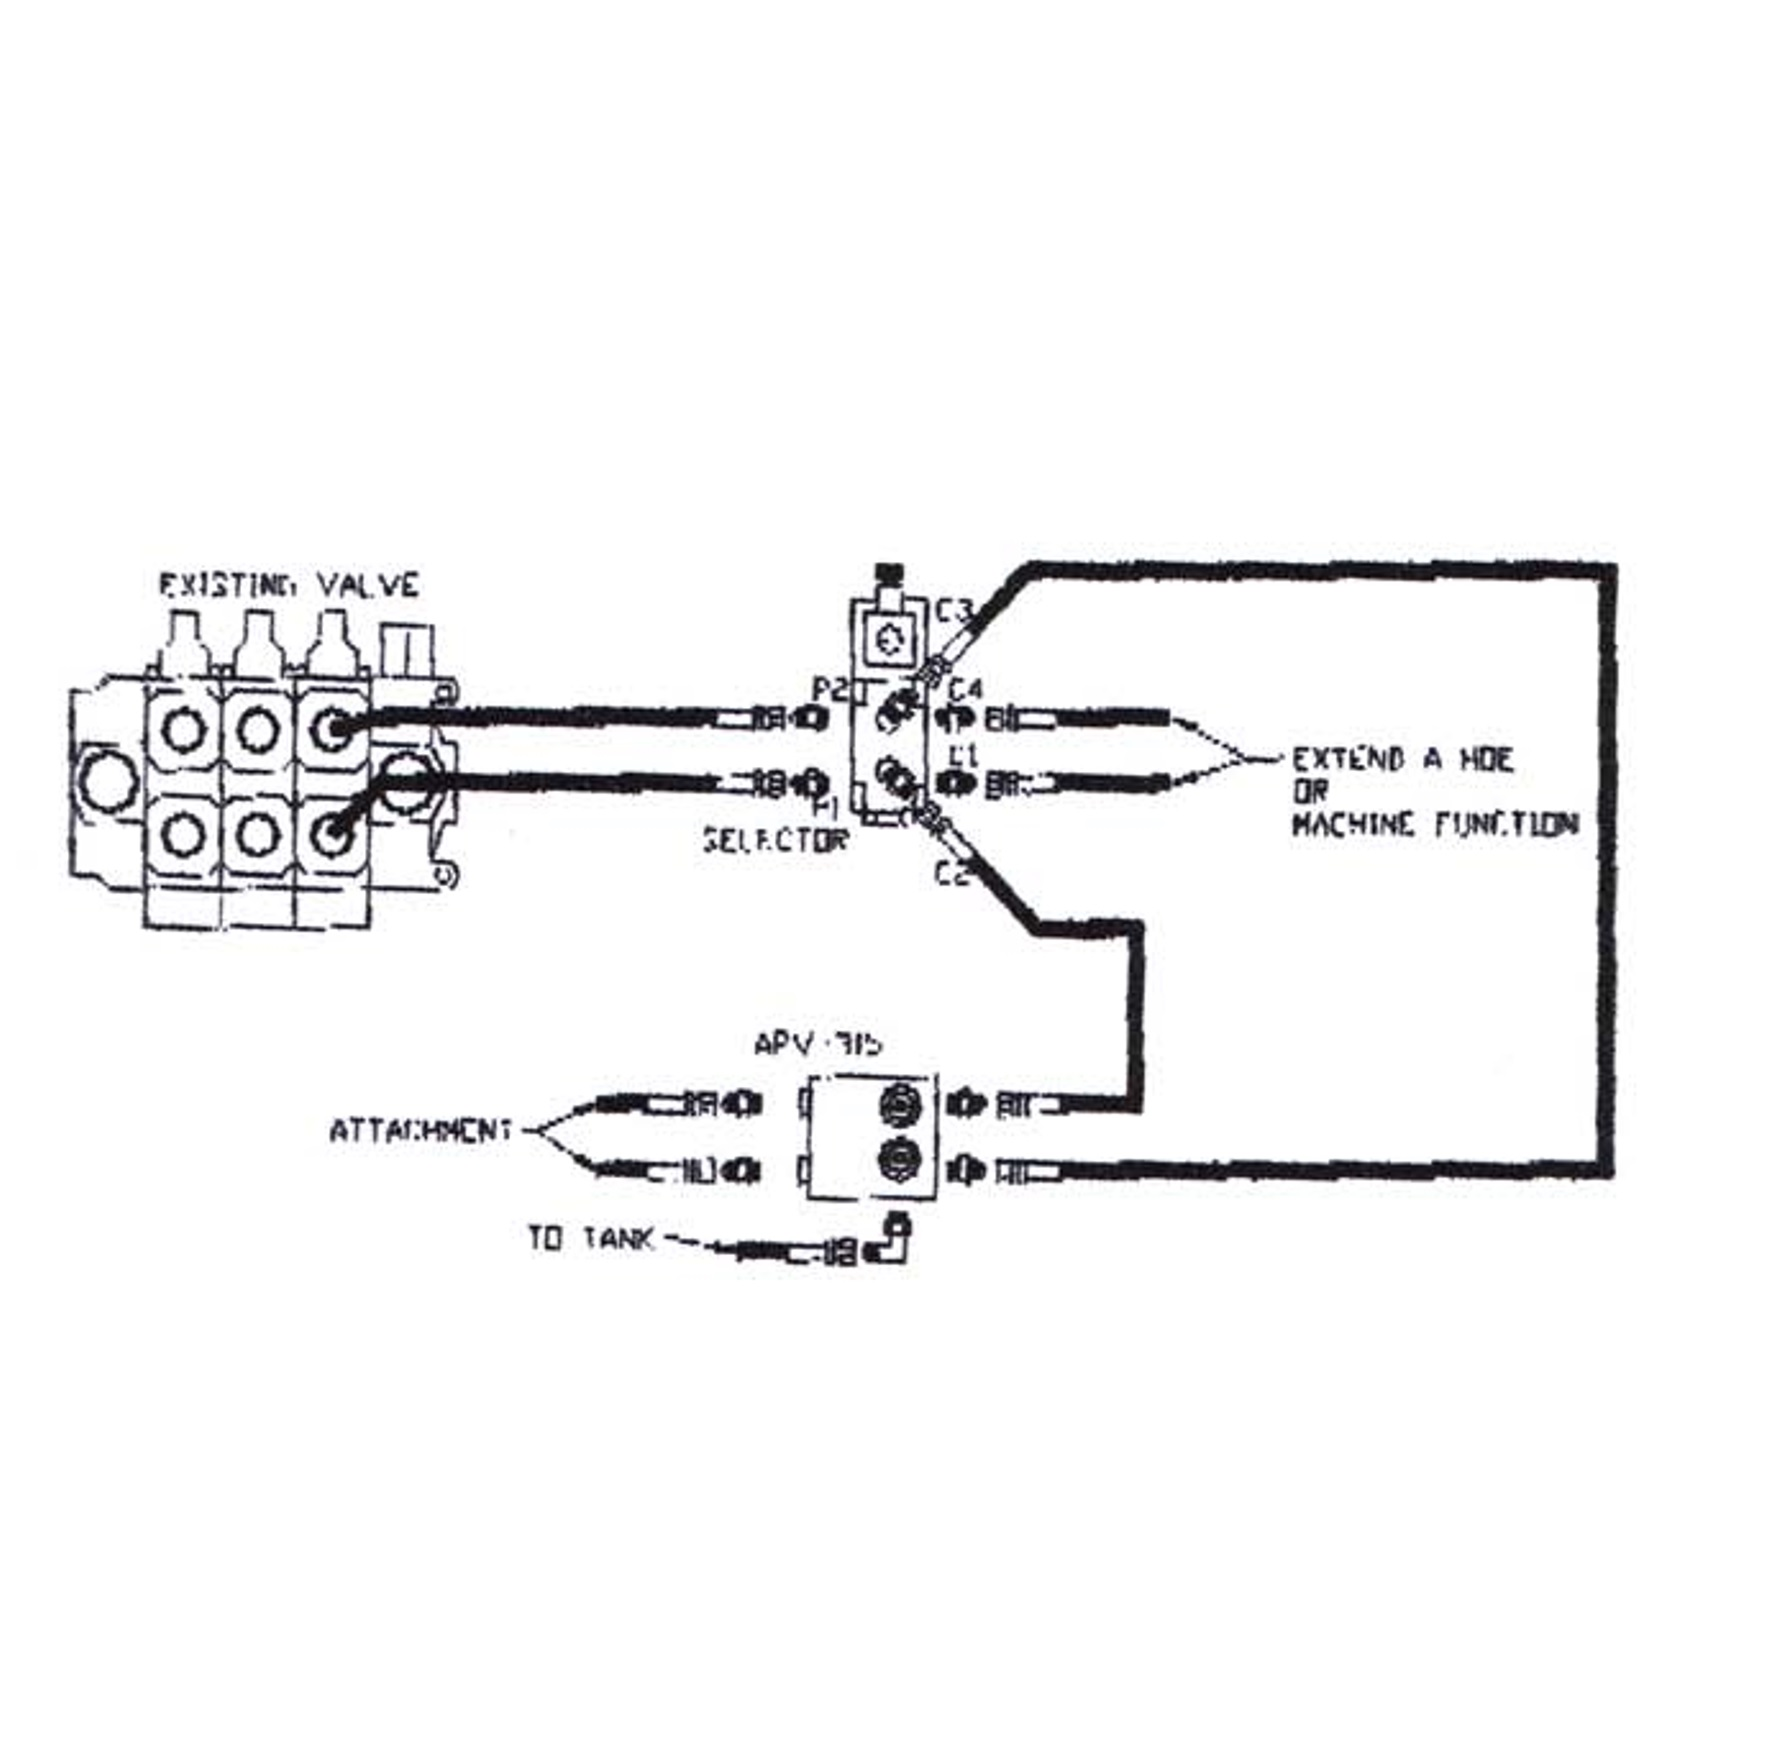 Hydraulic Diverter Kits For Backhoes Amp Excavators Dsp12 Pb